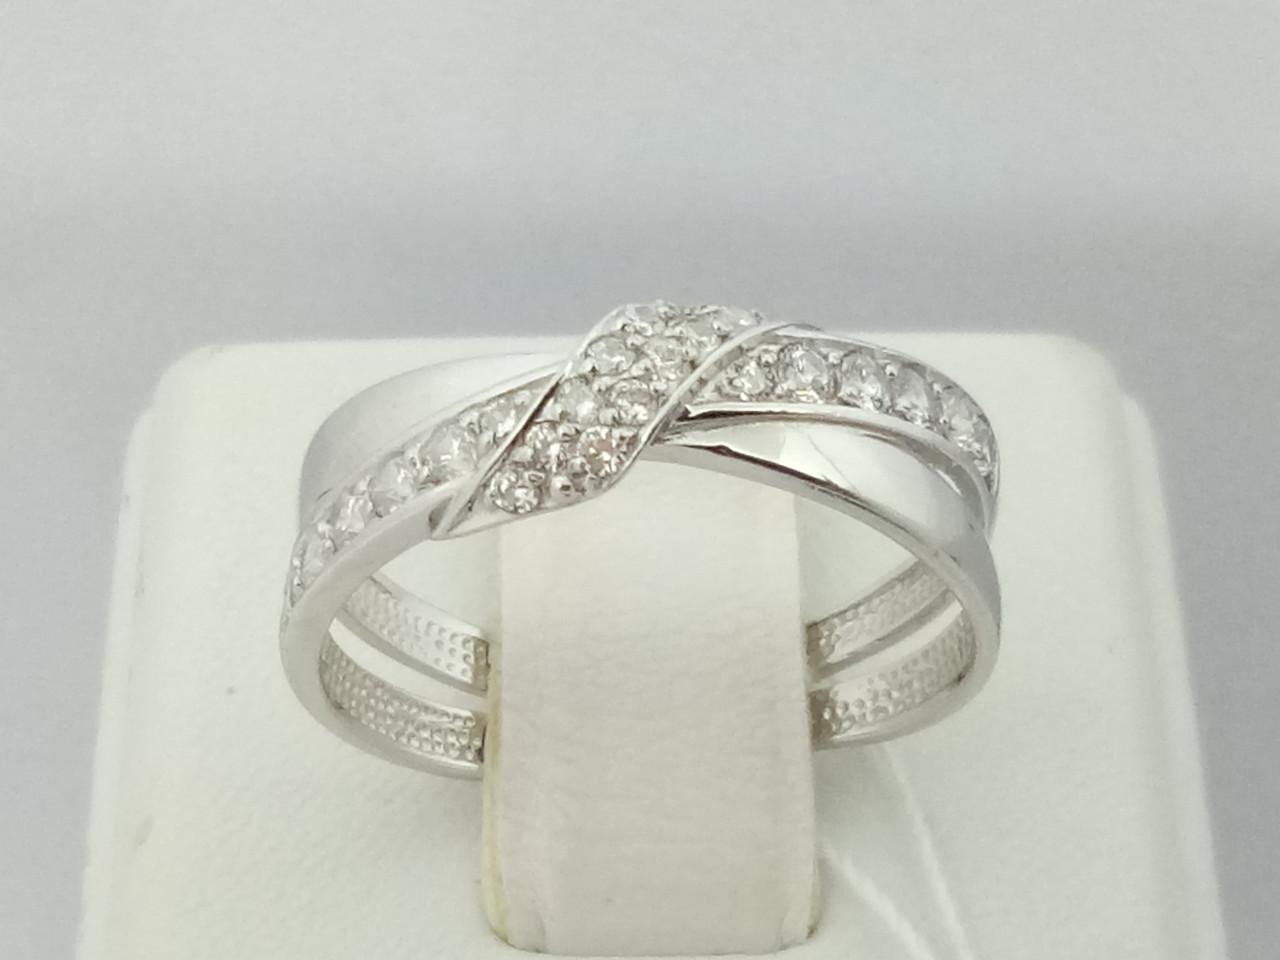 Серебряное кольцо с фианитами. Артикул 13807-Р 17,5